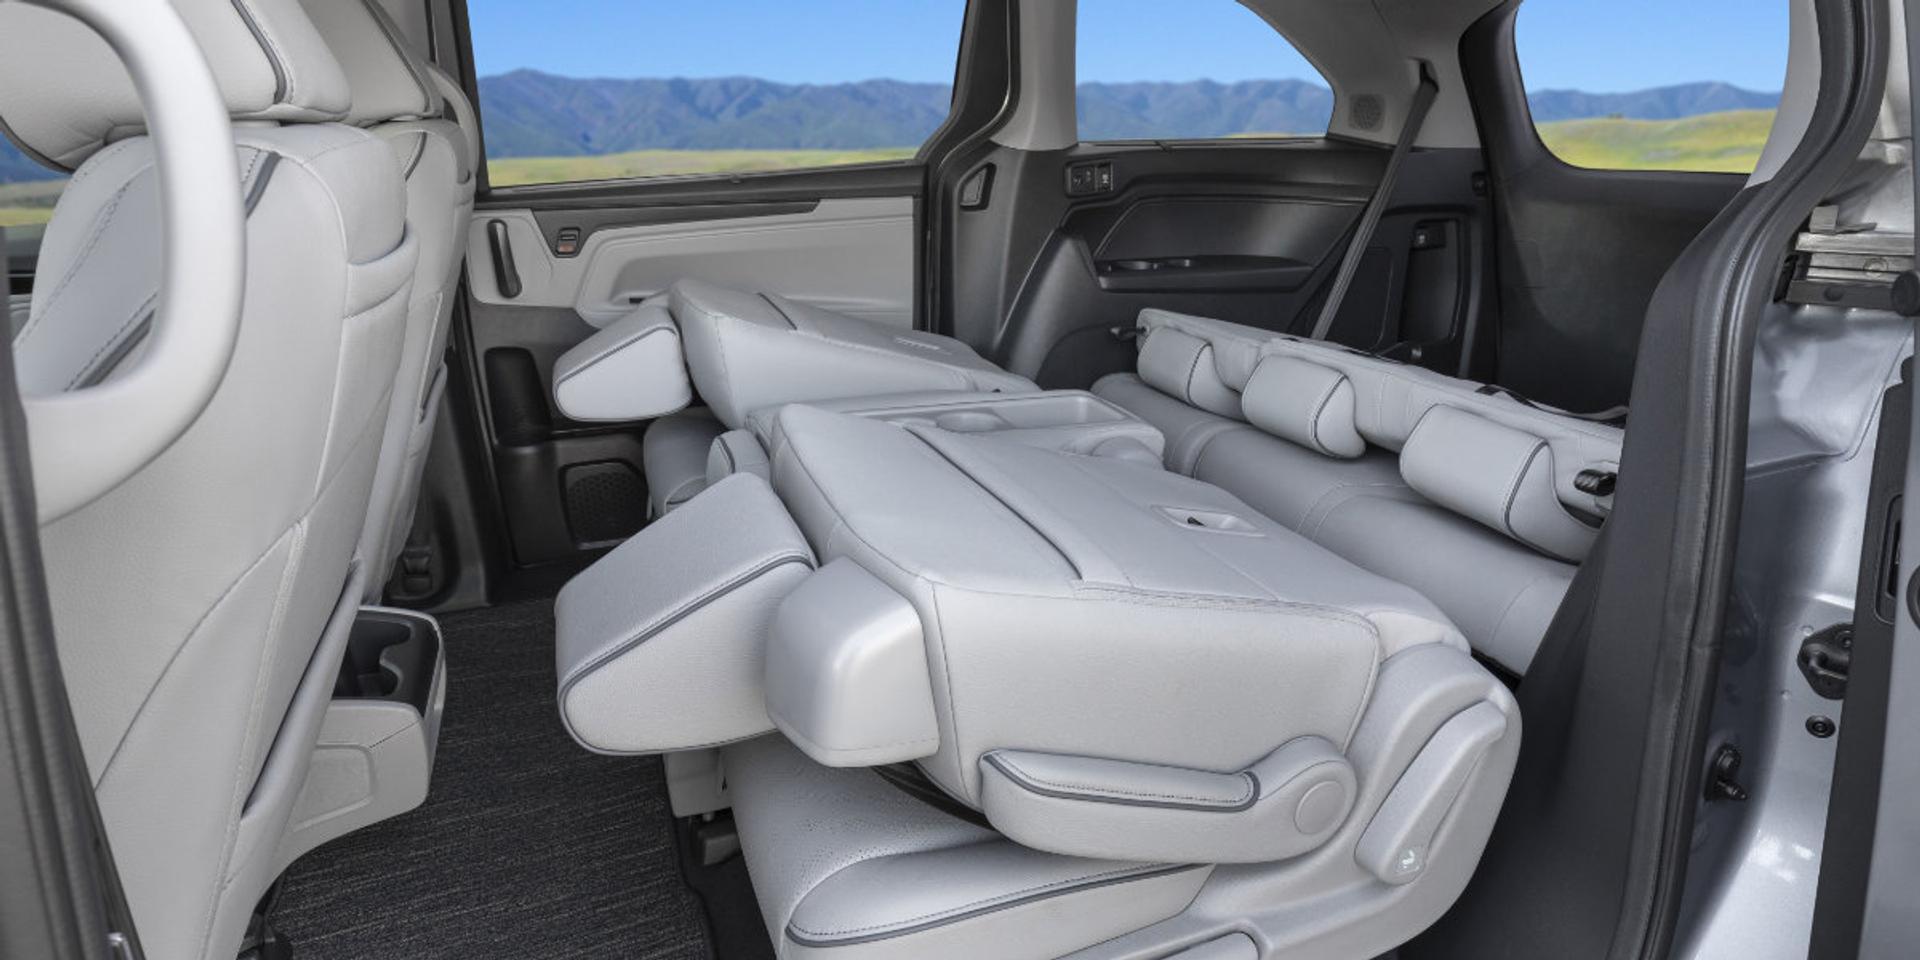 Honda Odyssey rear passenger seating